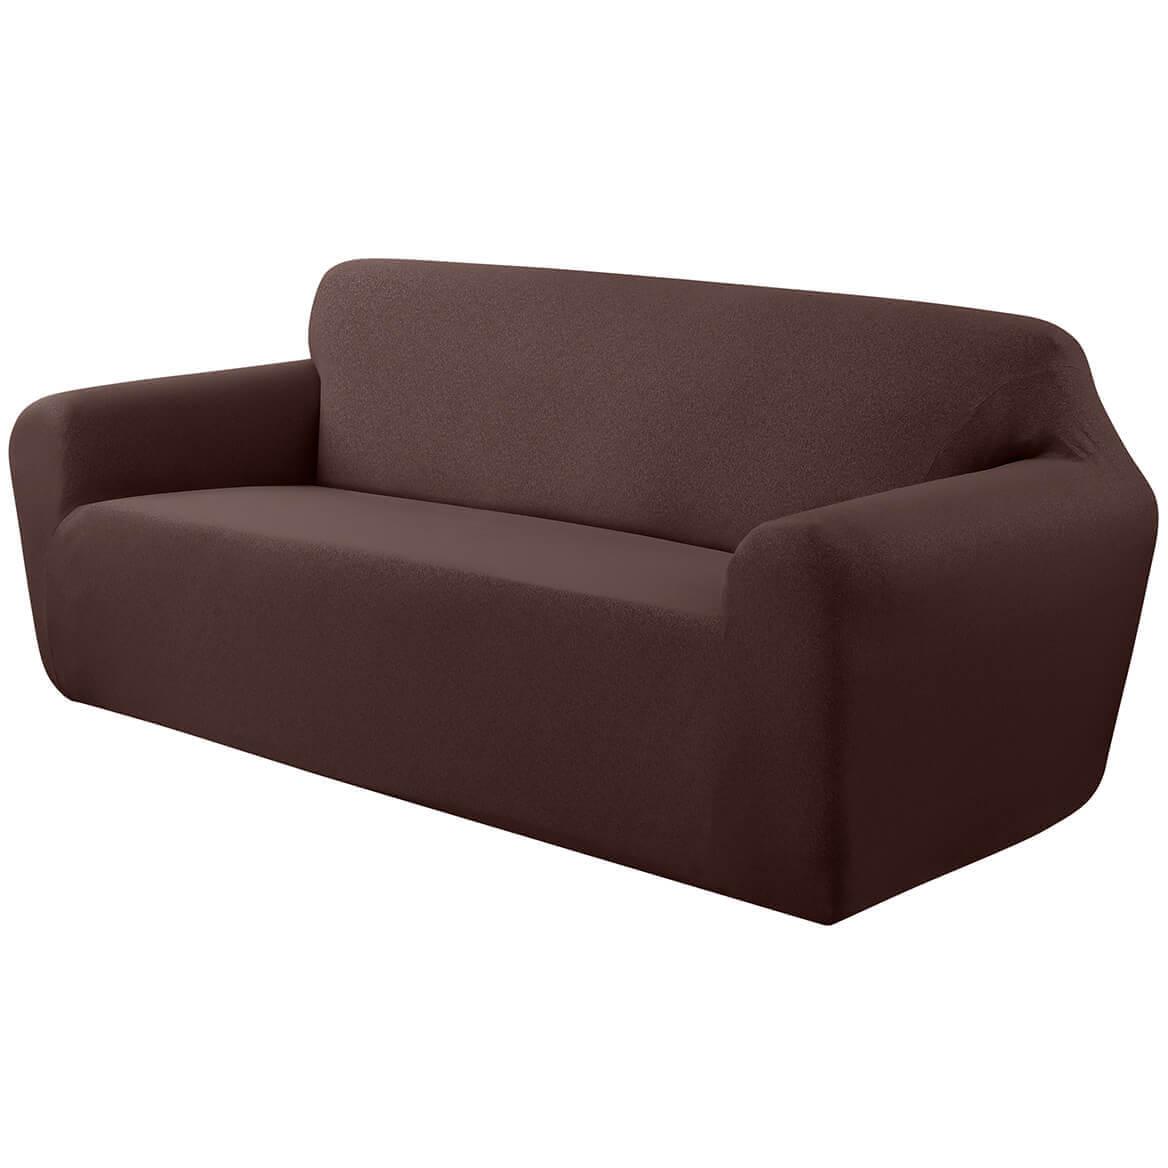 Kathy Ireland Ingenue Sofa Slipcover